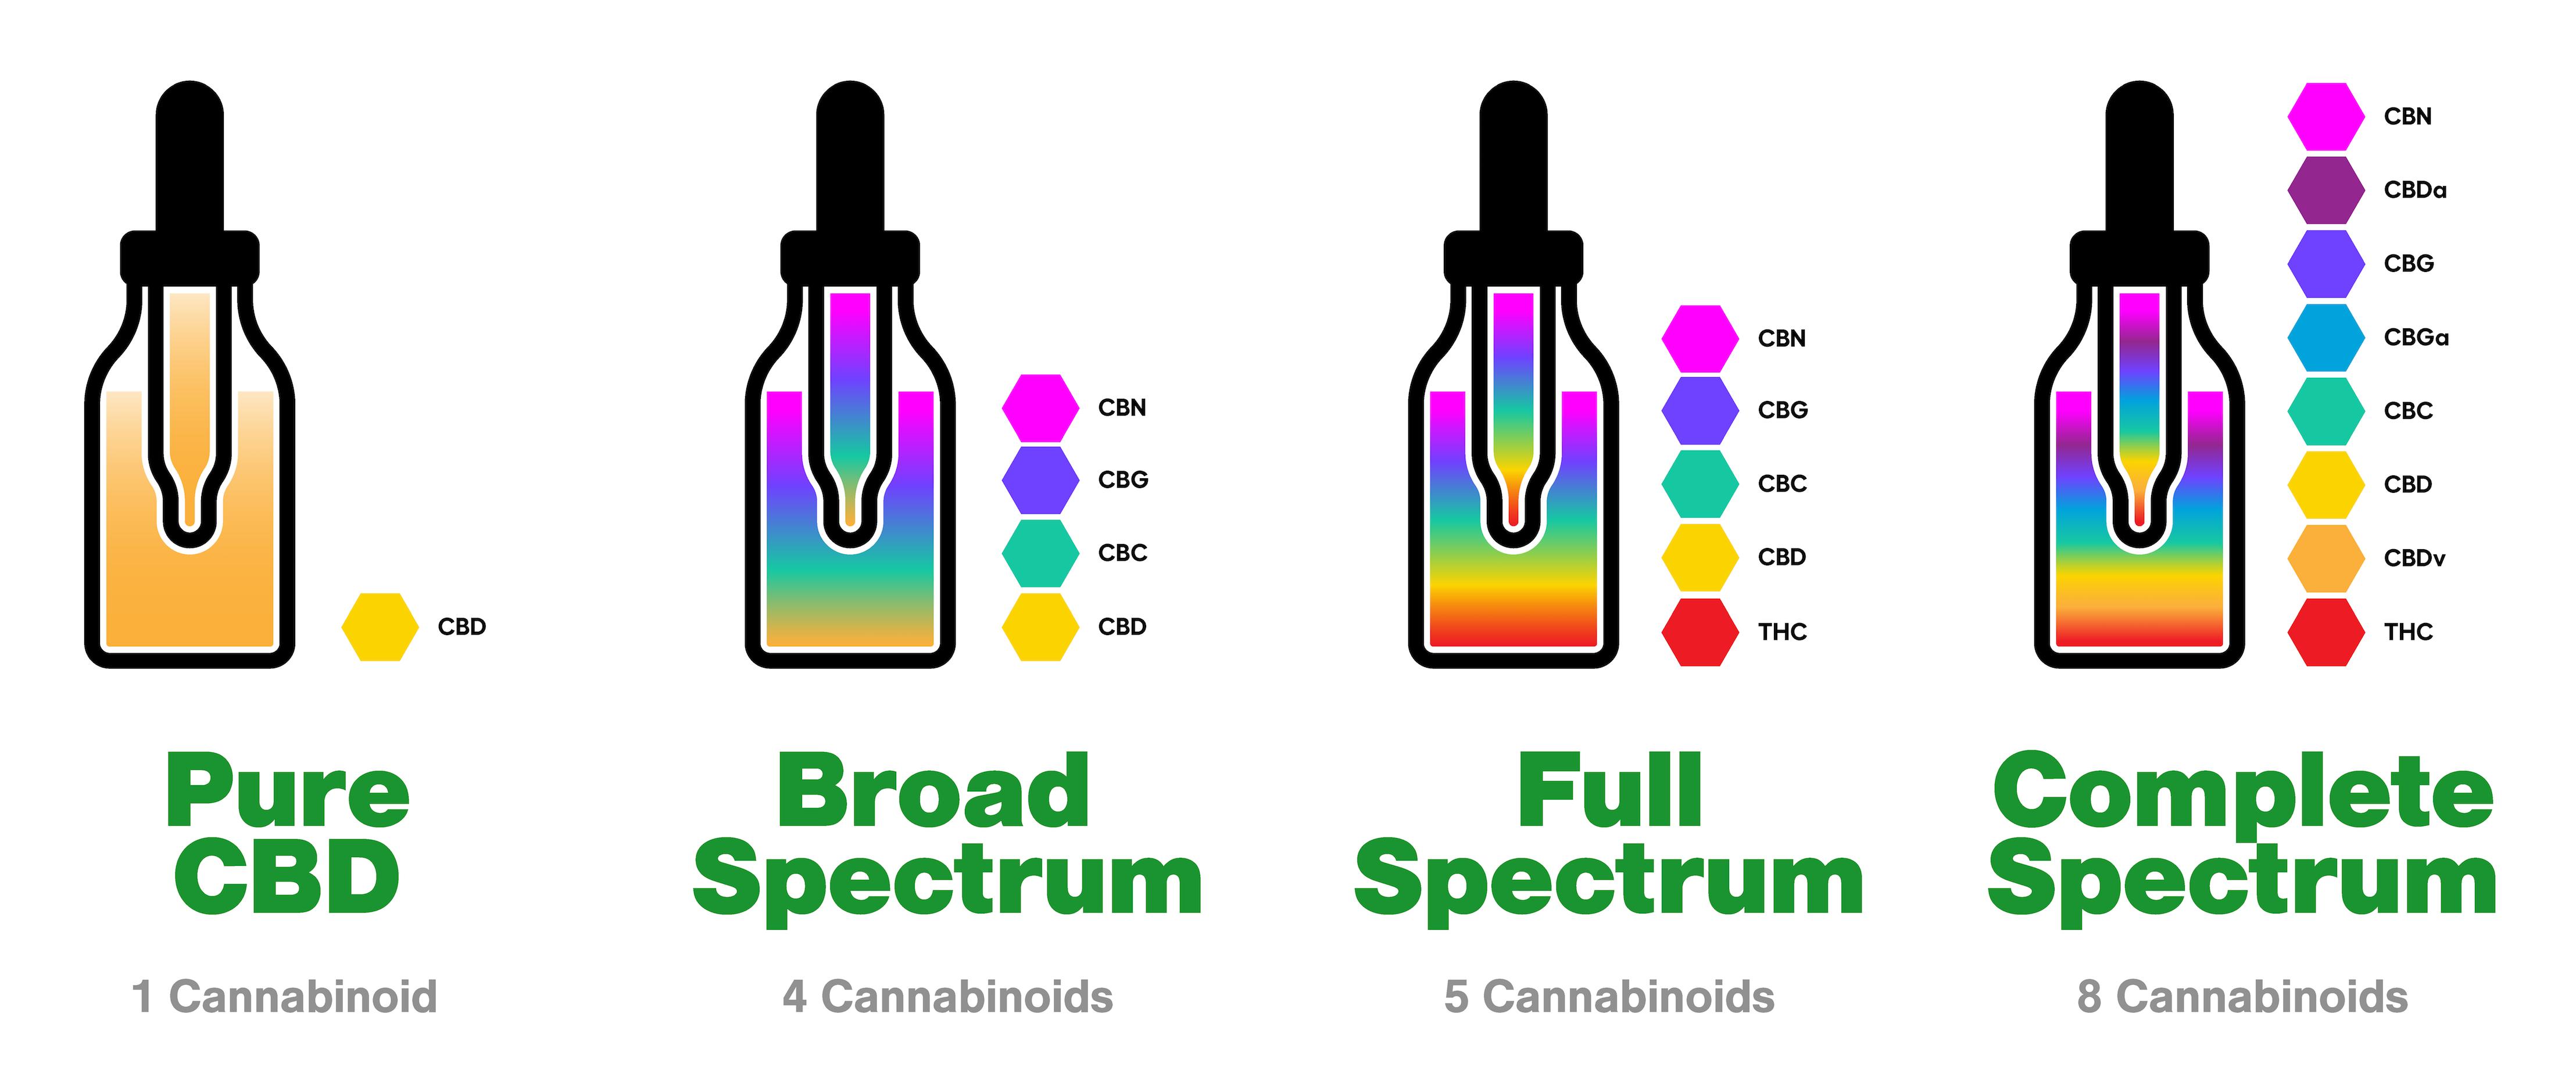 tweedle-farms-spectrum-infographic.png